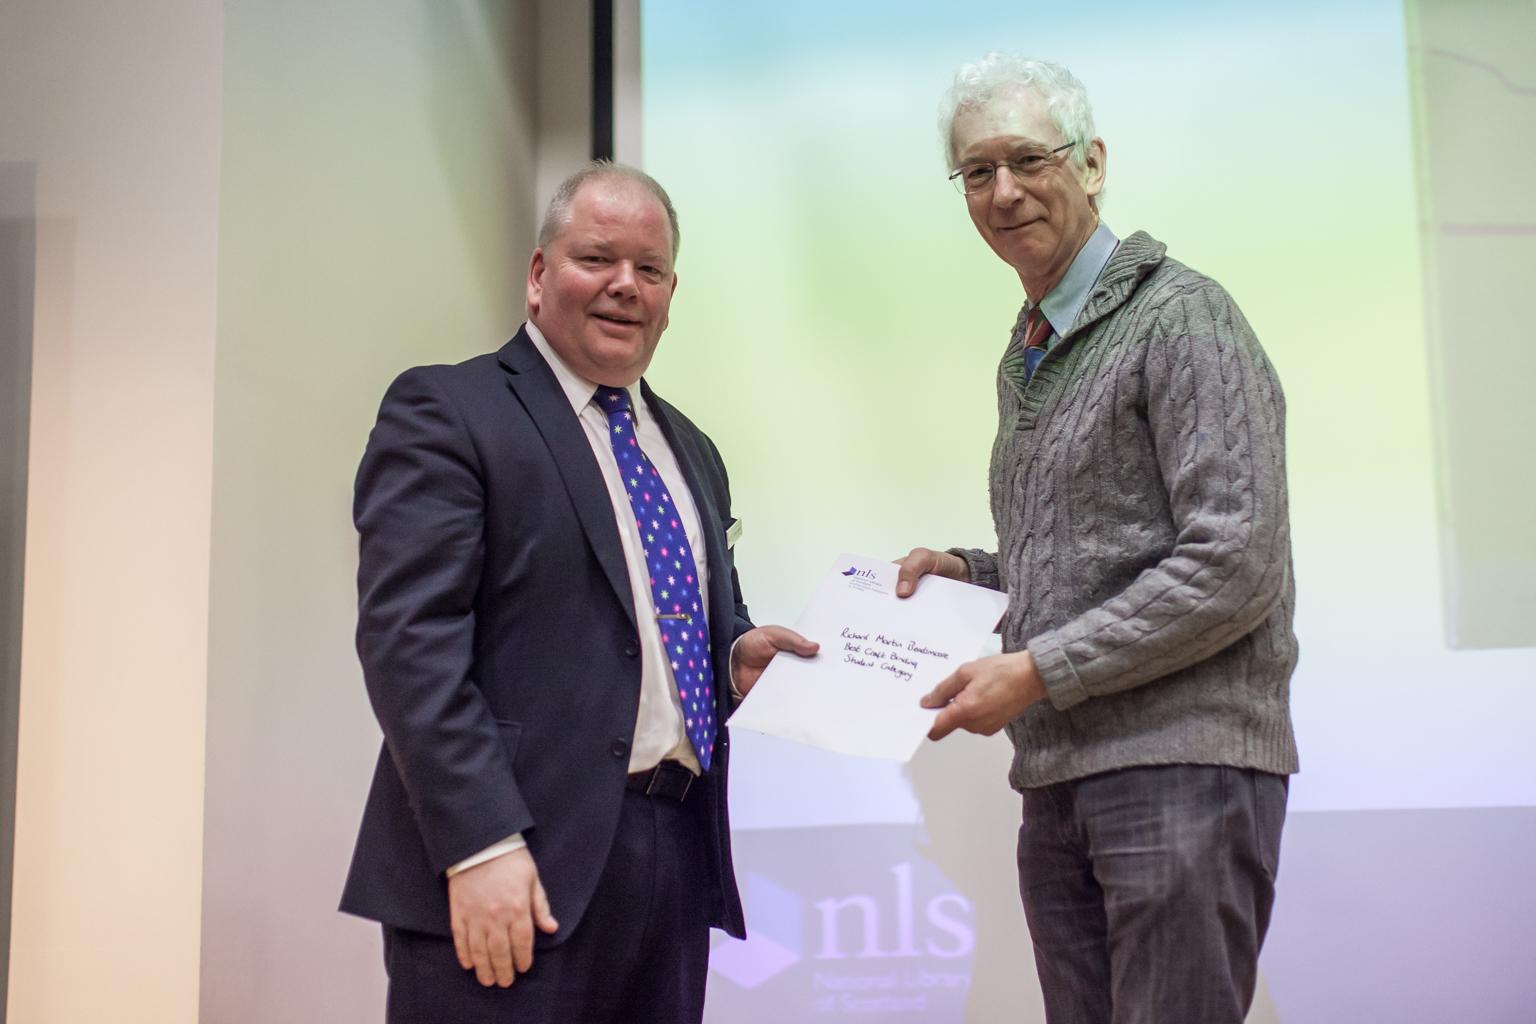 NATIONAL LIBRARY OF SCOTLAND Elizabeth Soutar Award